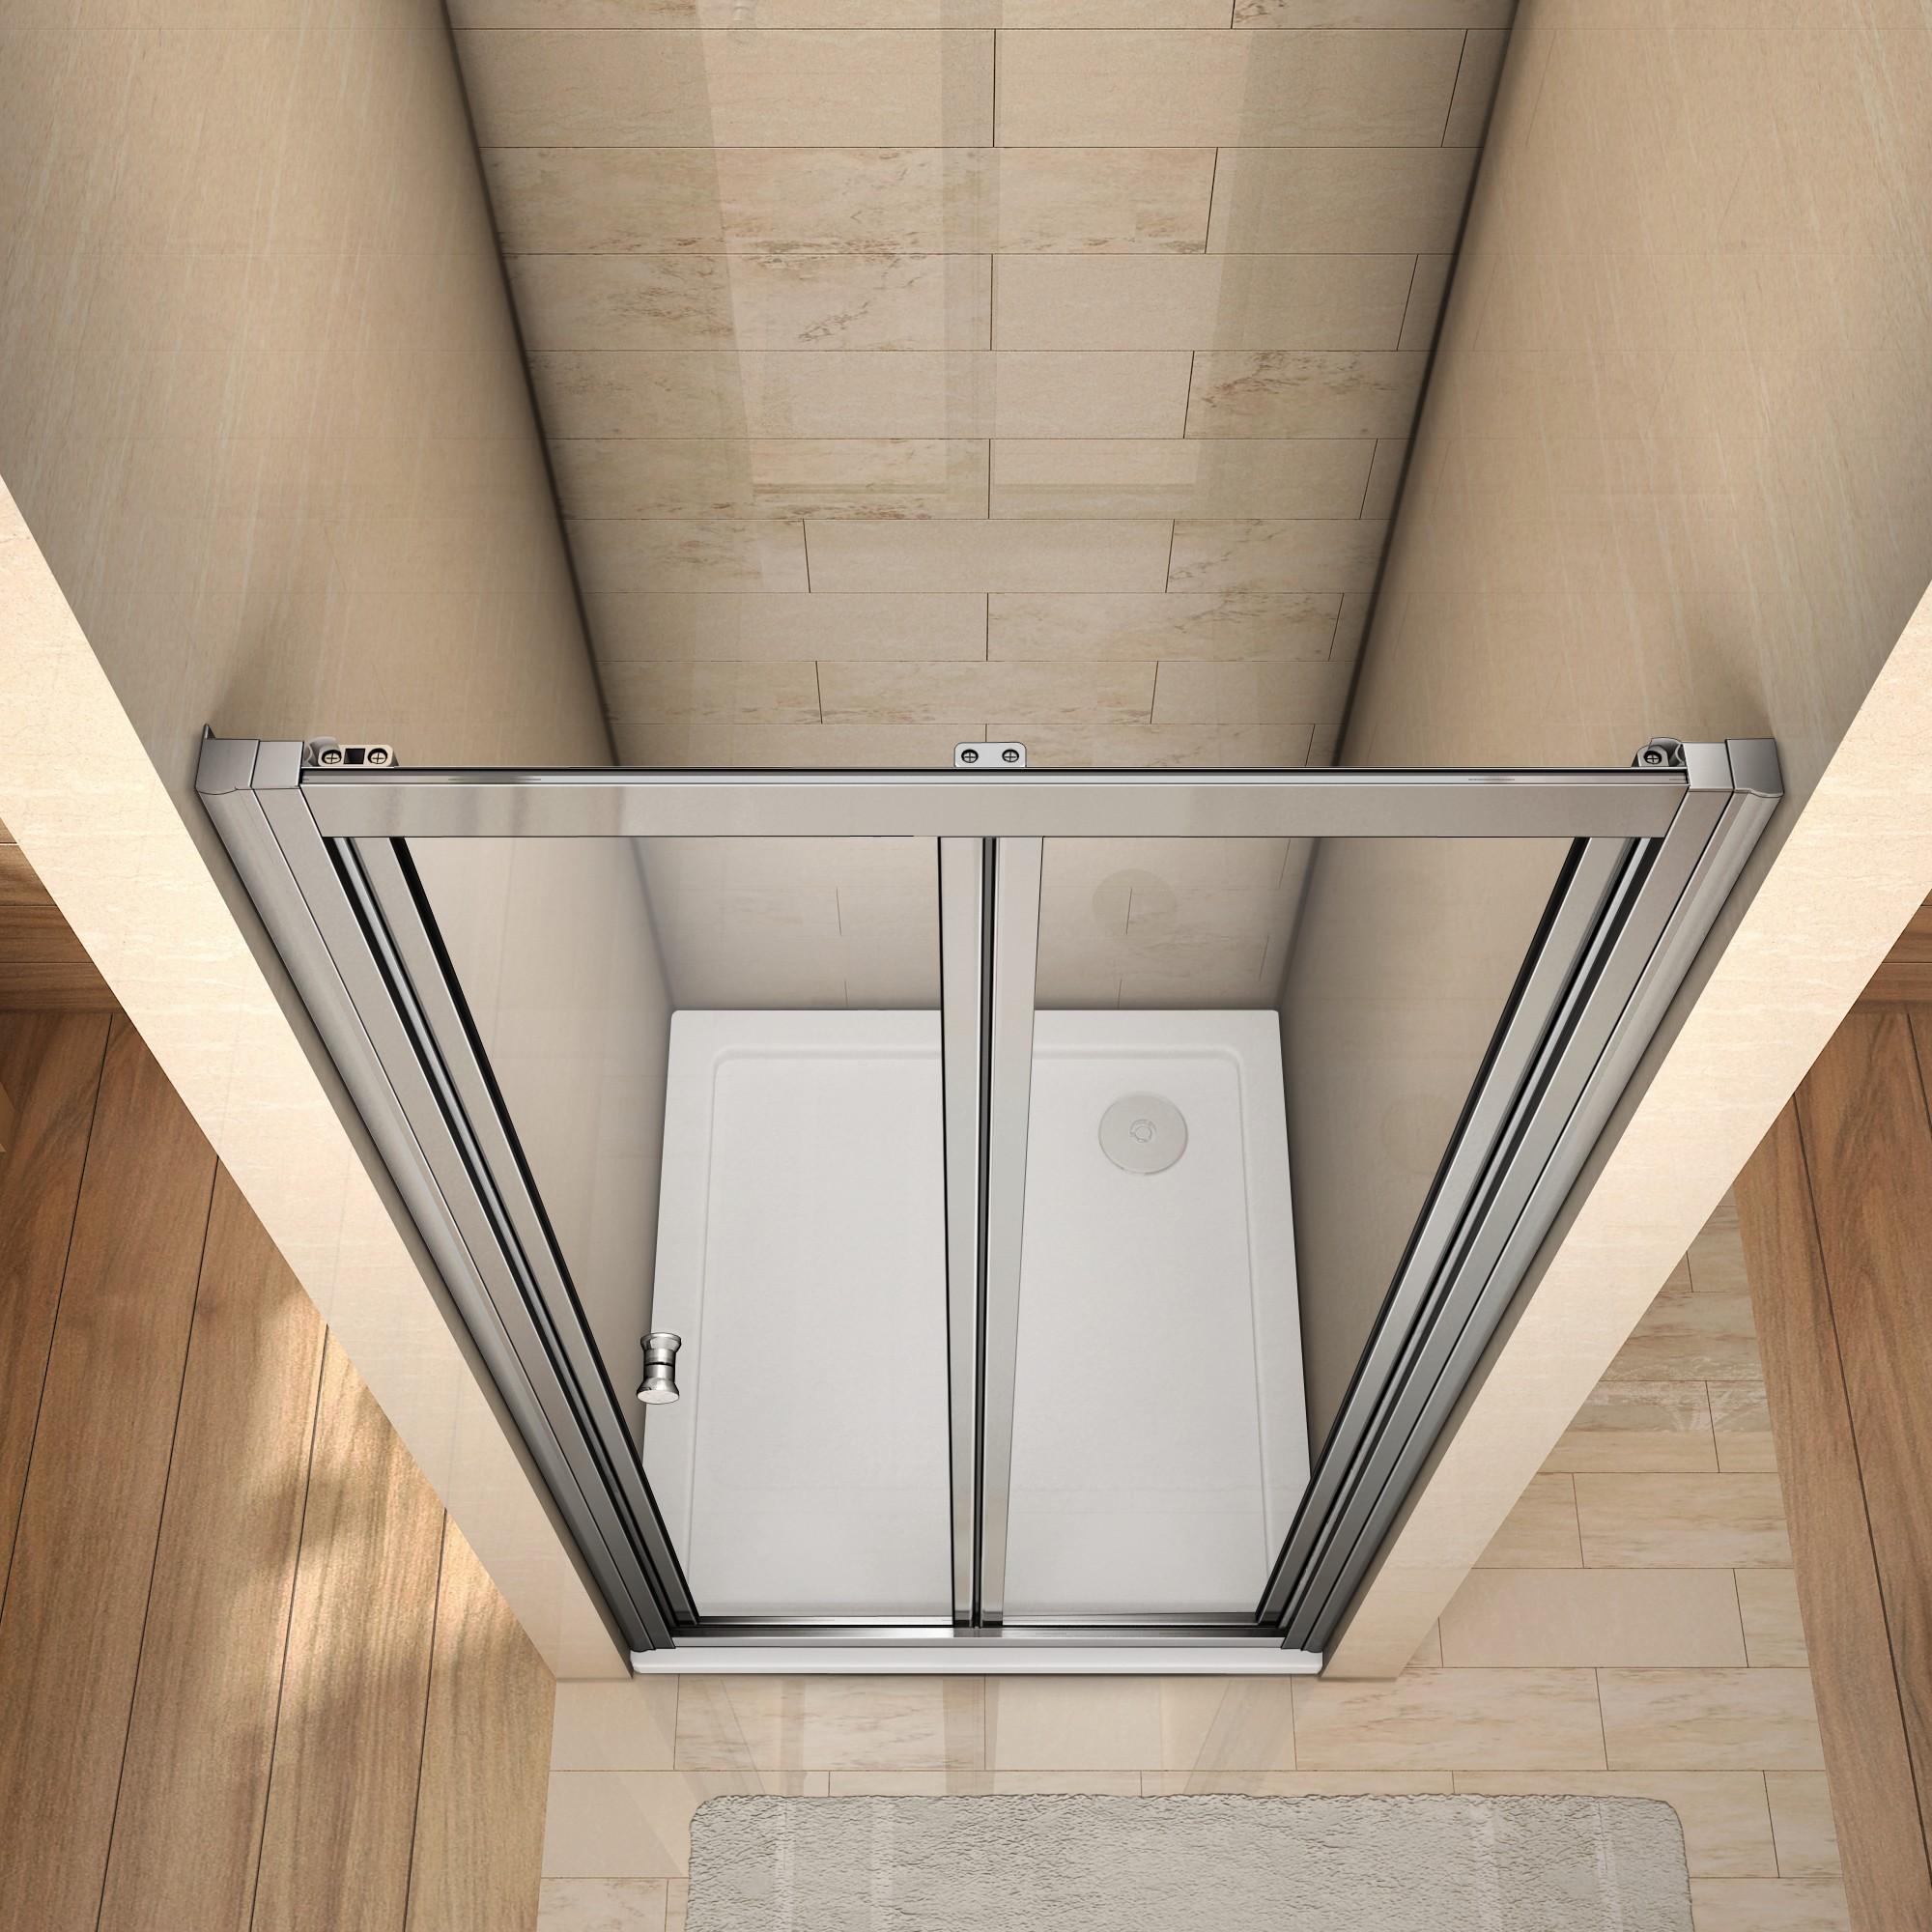 eckdusche duschkabine faltt r duschabtrennung duschwand echtglas dusche 76 100cm ebay. Black Bedroom Furniture Sets. Home Design Ideas